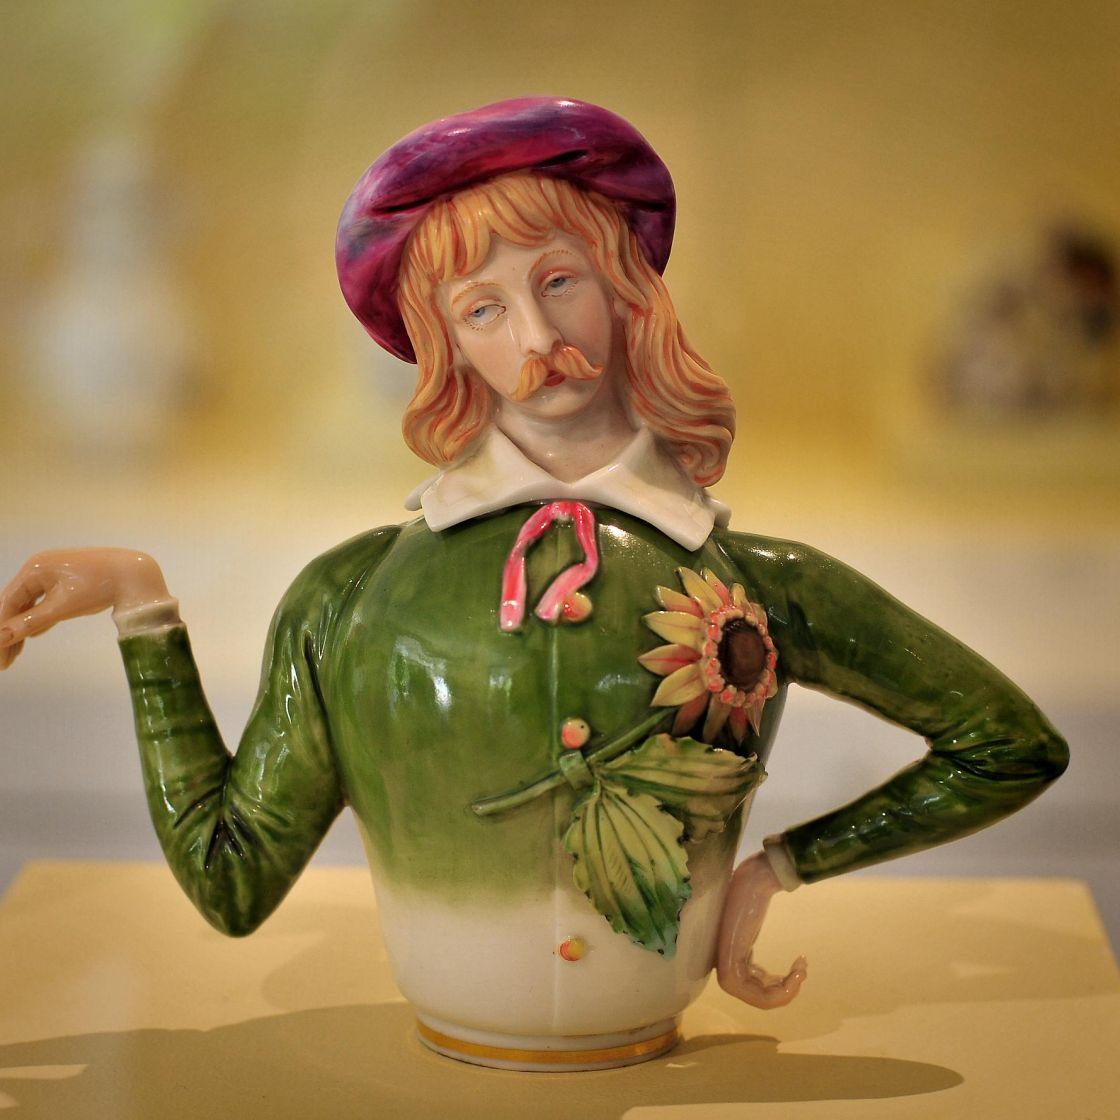 Aesthetic teapot